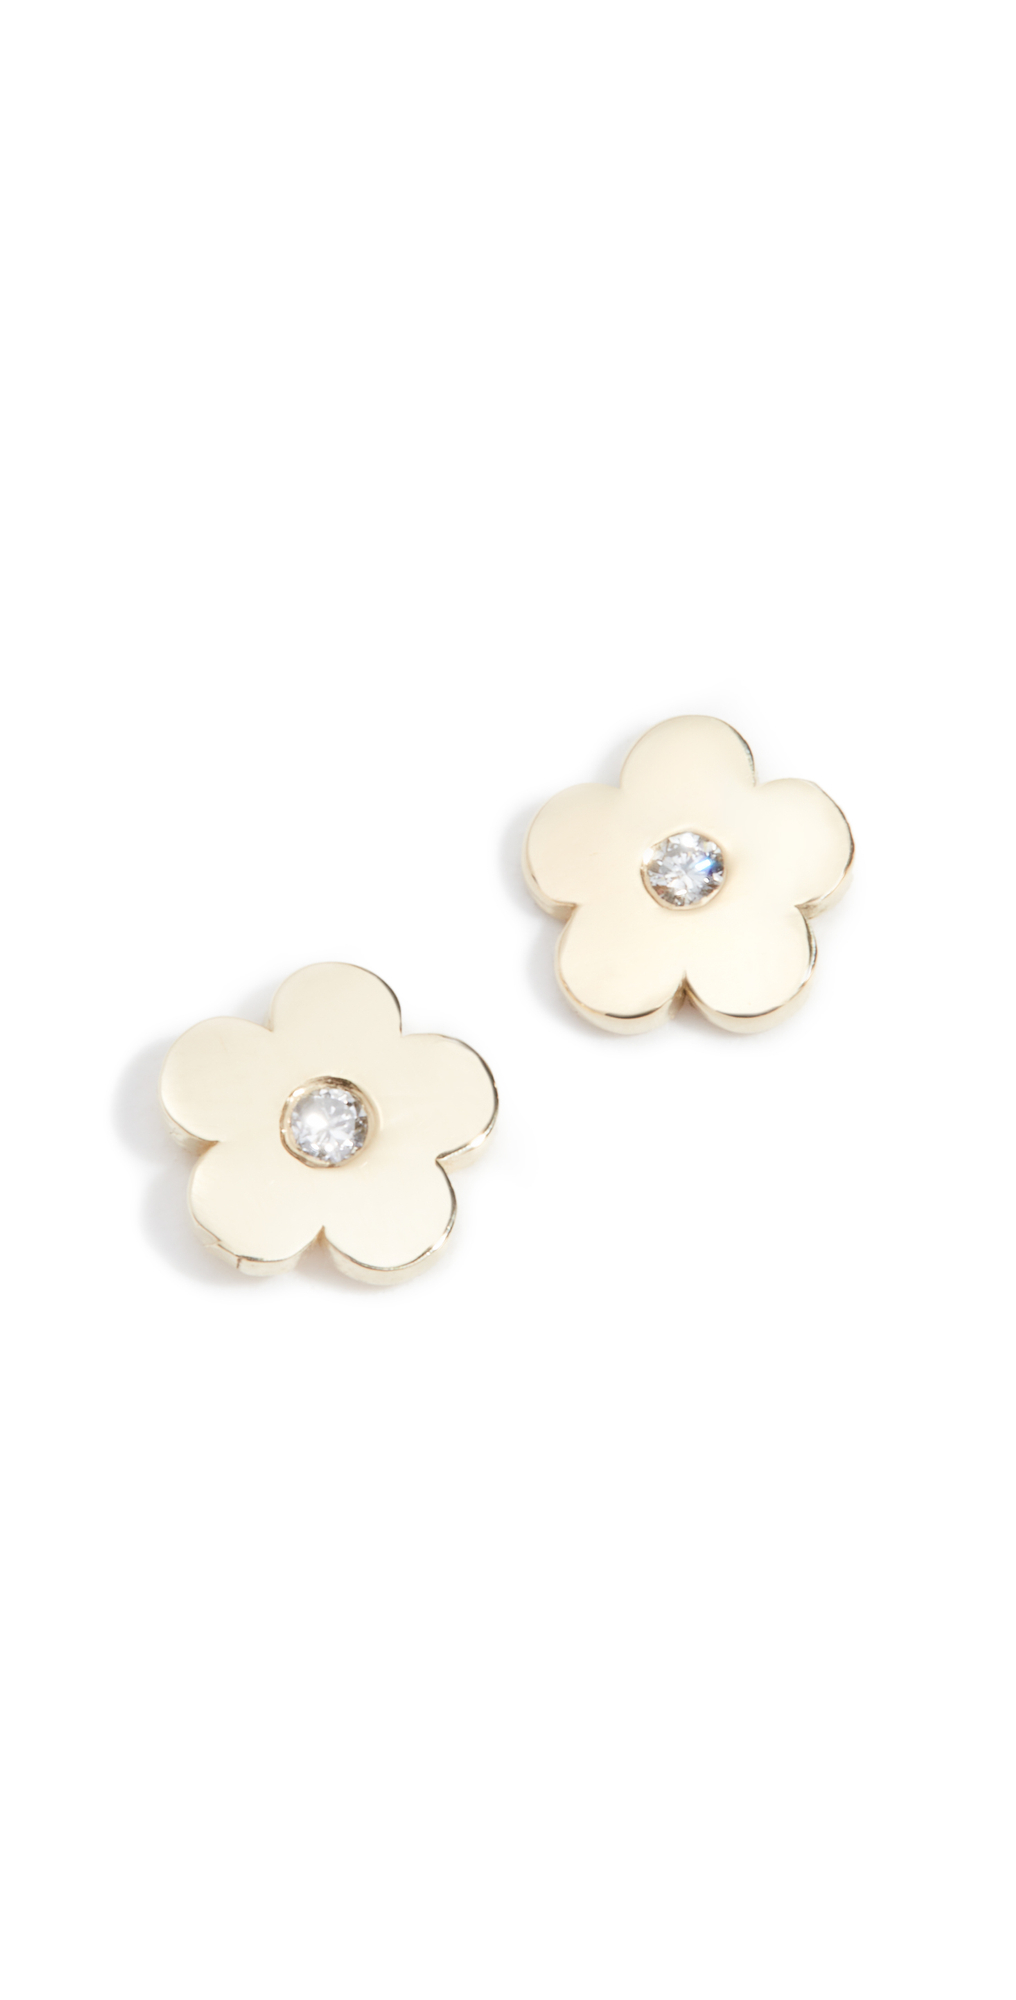 Mini Daisy Diamond Center Earrings